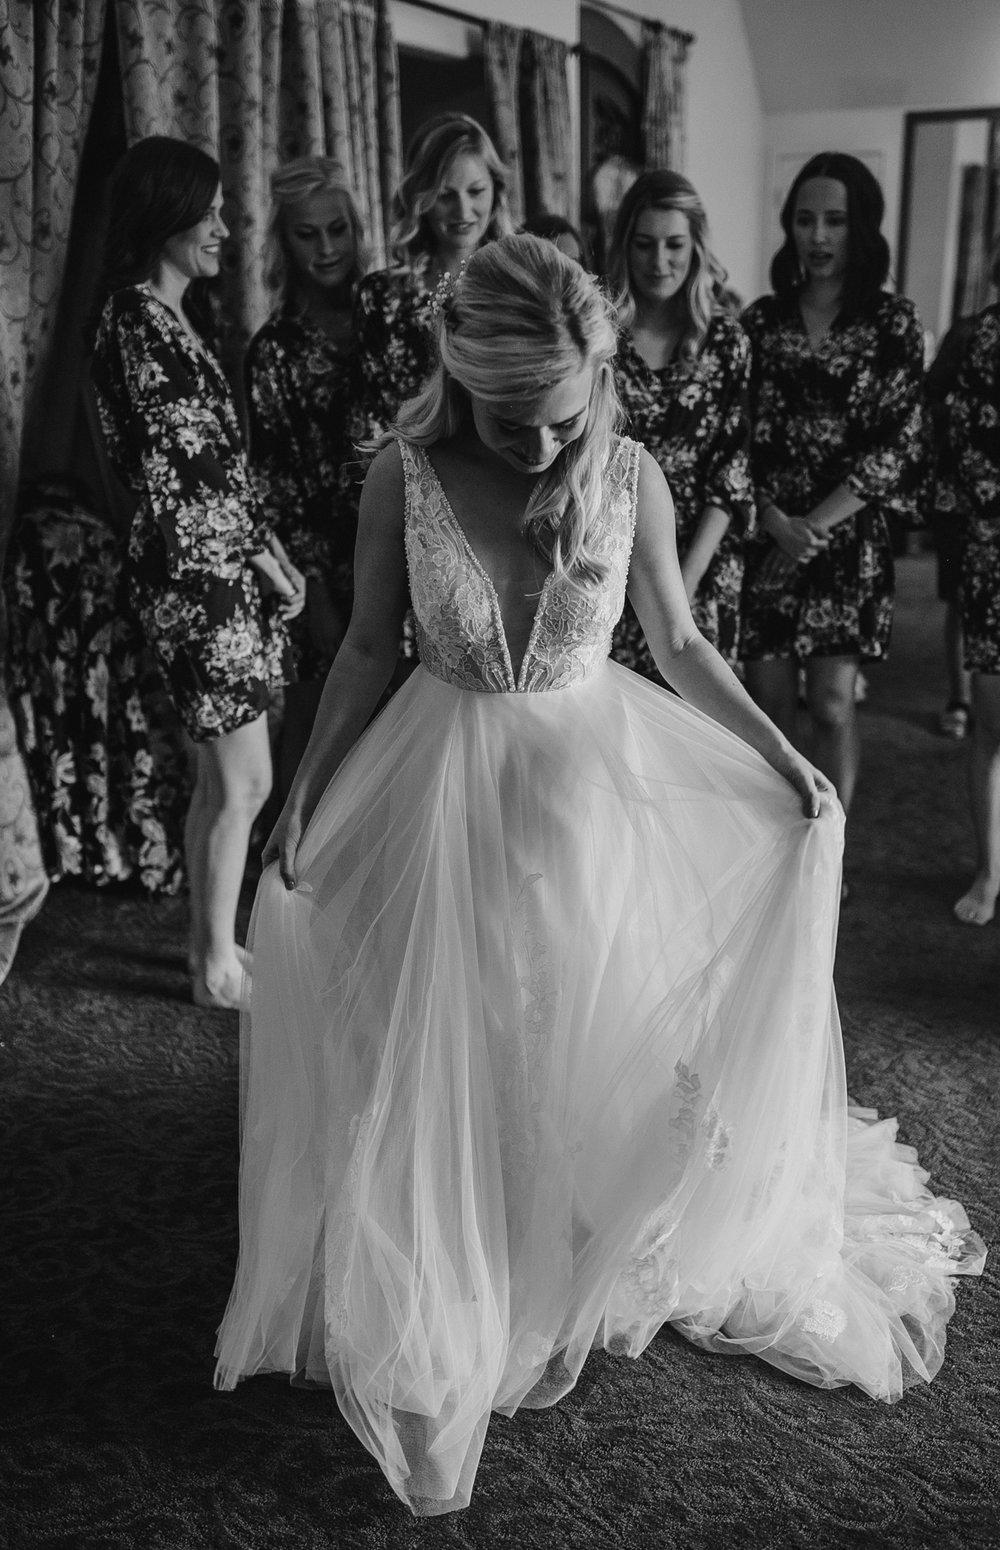 zenith-vineyard-oregon-summer-wedding-130.jpg